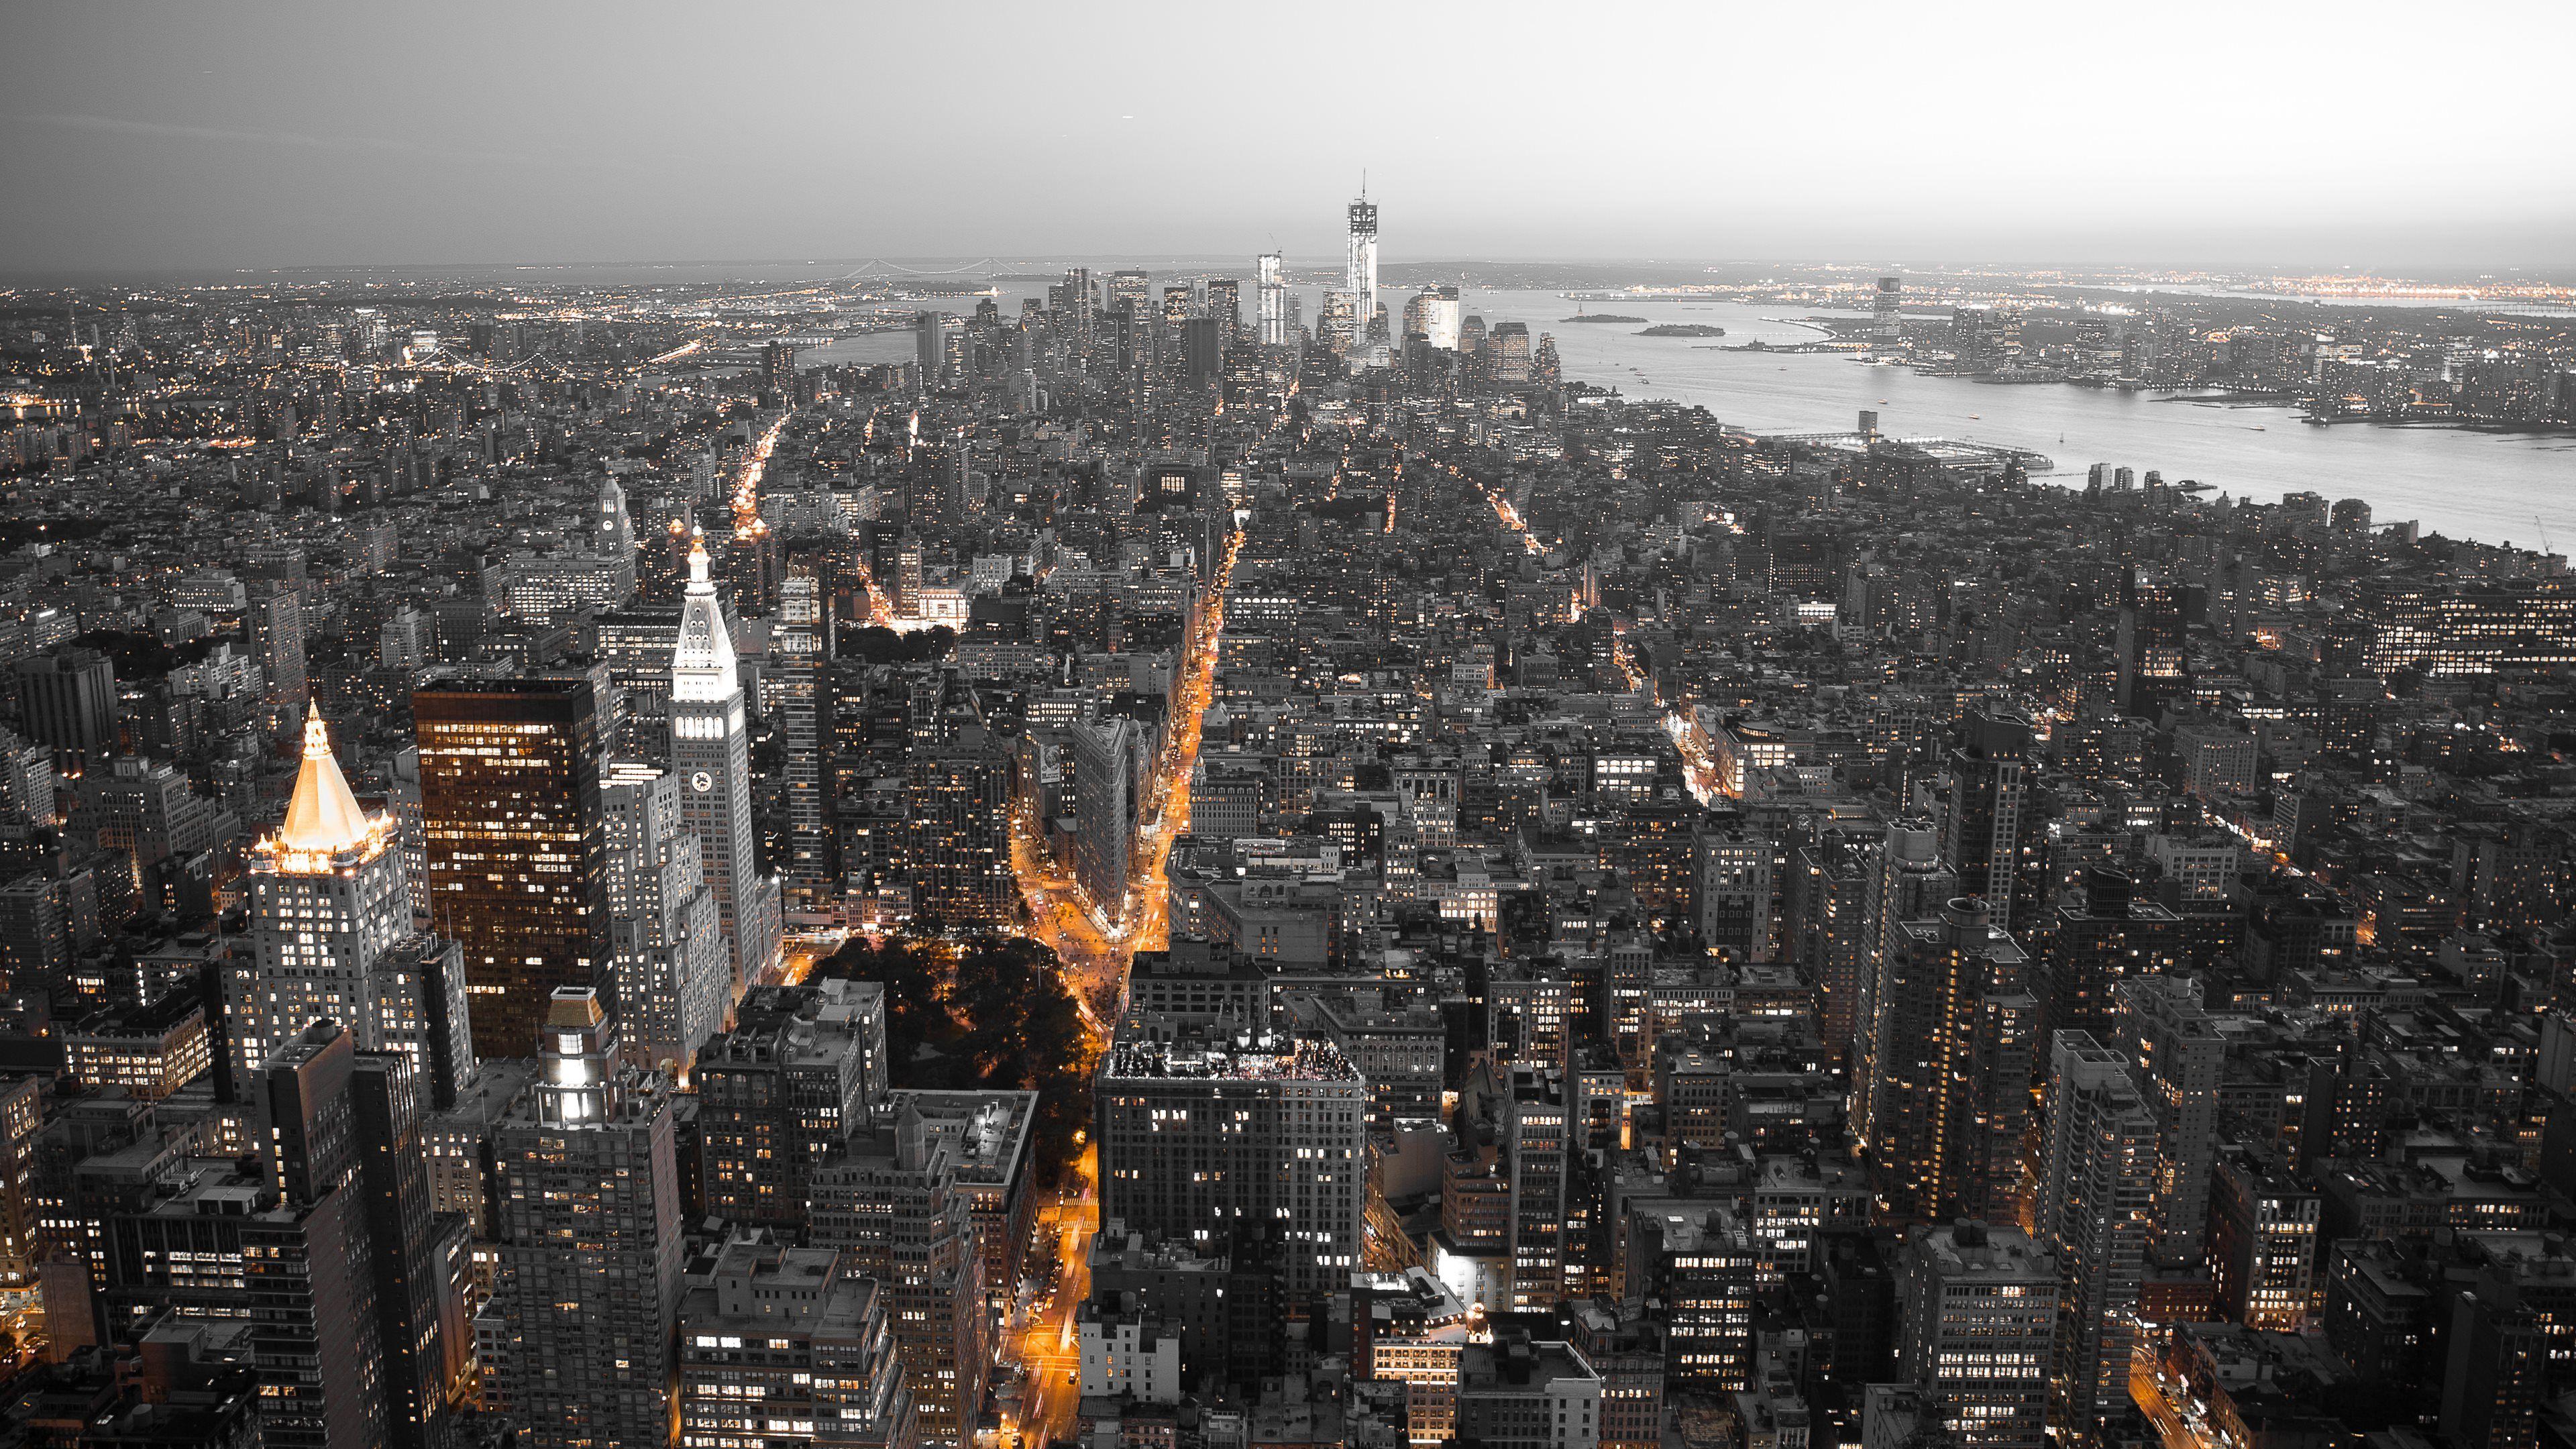 Newyork City View 4k Wallpaper Wide Screen Wallpaper 1080p 2k 4k City Skyline Wallpaper View Wallpaper City View Wallpaper